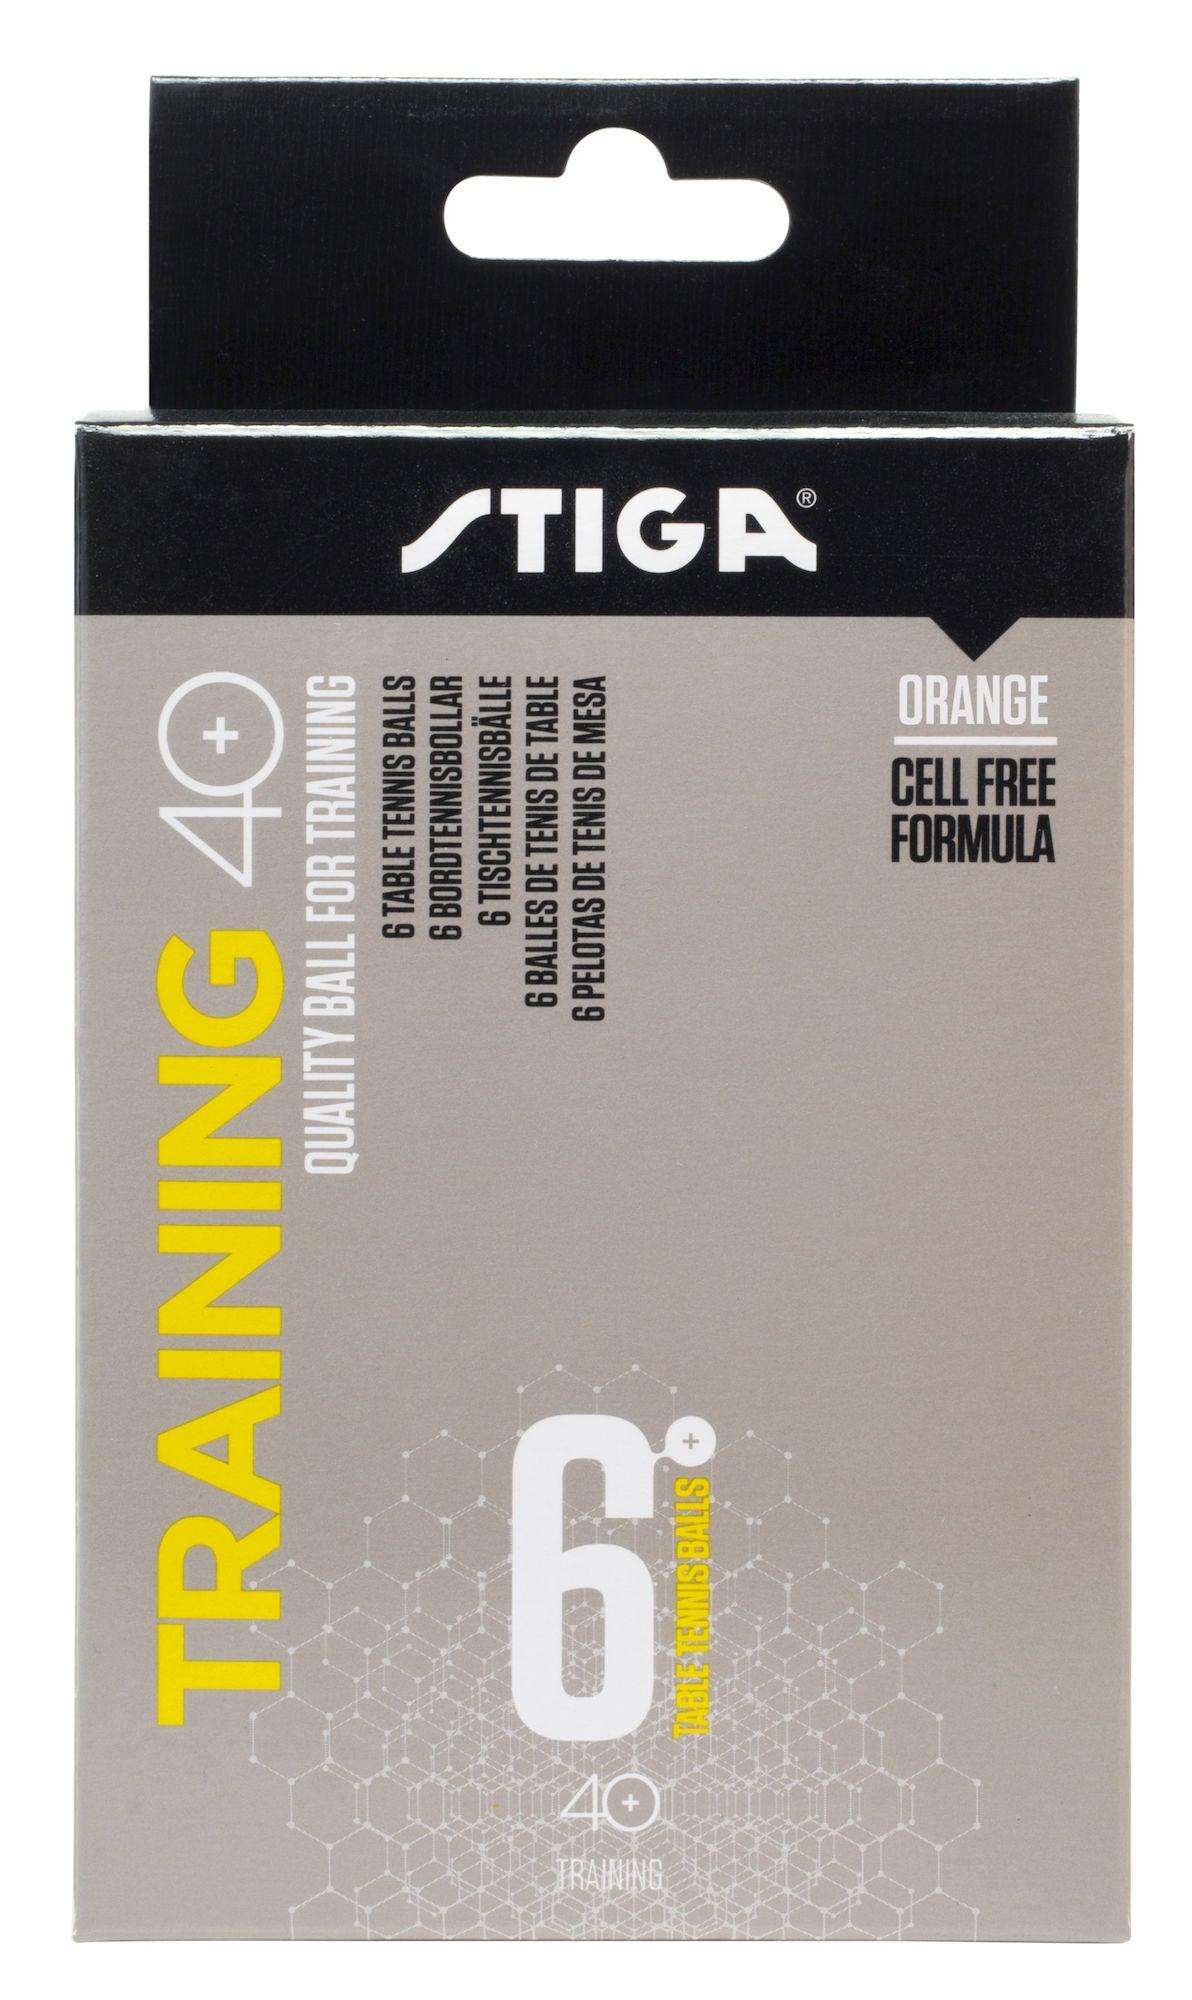 STIGA Bollar Bordtennis Training ABS 6-pack, Orange